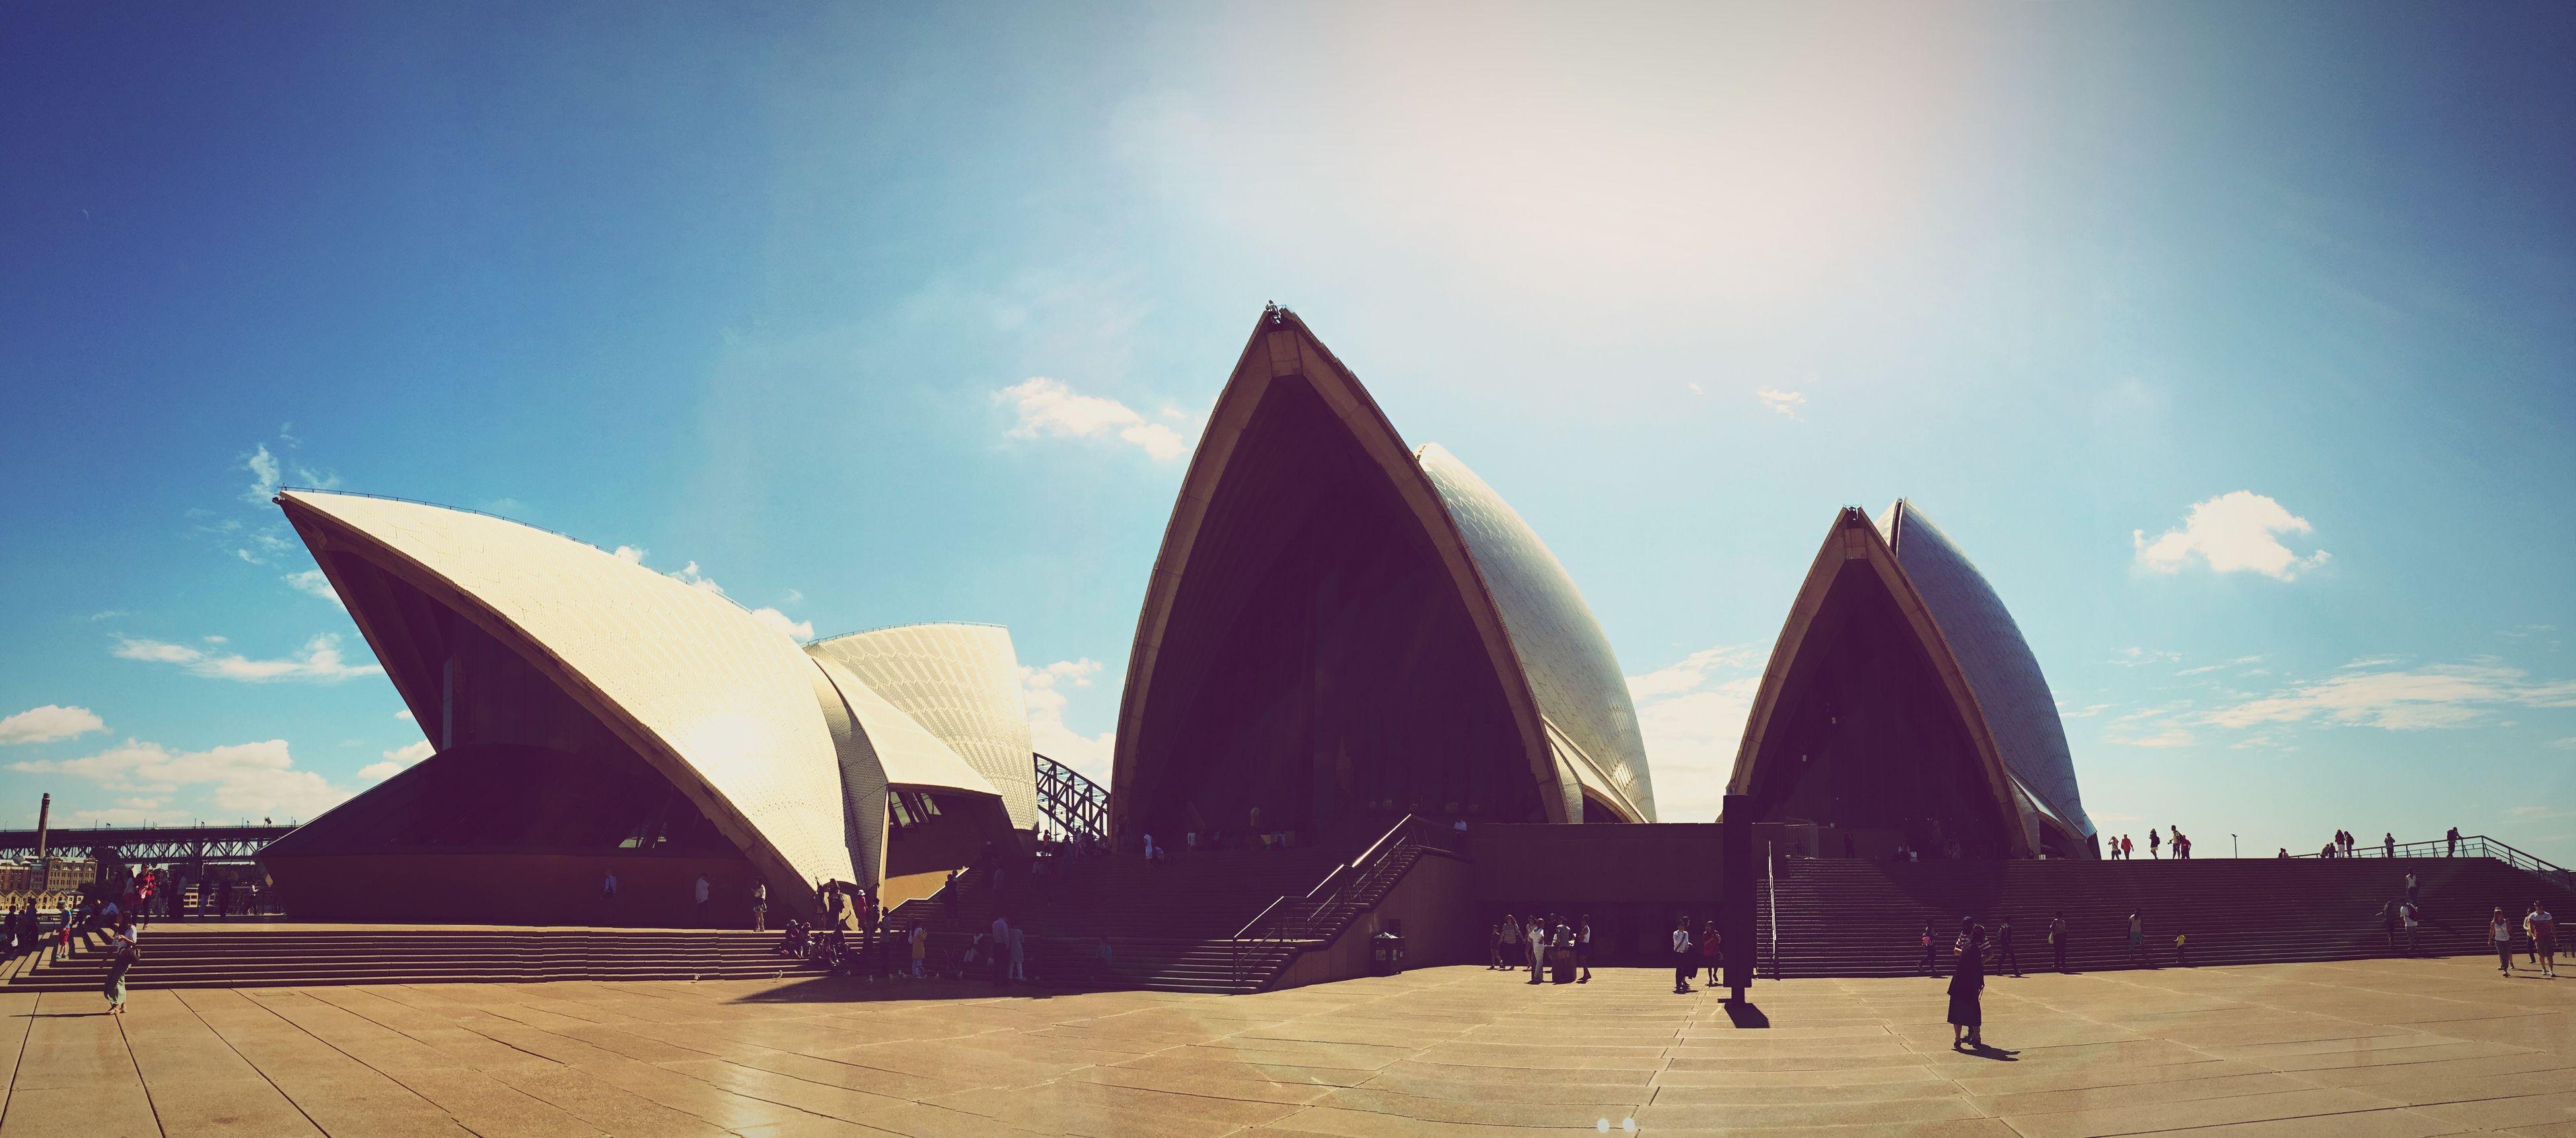 sky, built structure, architecture, sunlight, building exterior, cloud - sky, famous place, low angle view, blue, travel destinations, tourism, cloud, travel, leisure activity, incidental people, sunny, day, men, shadow